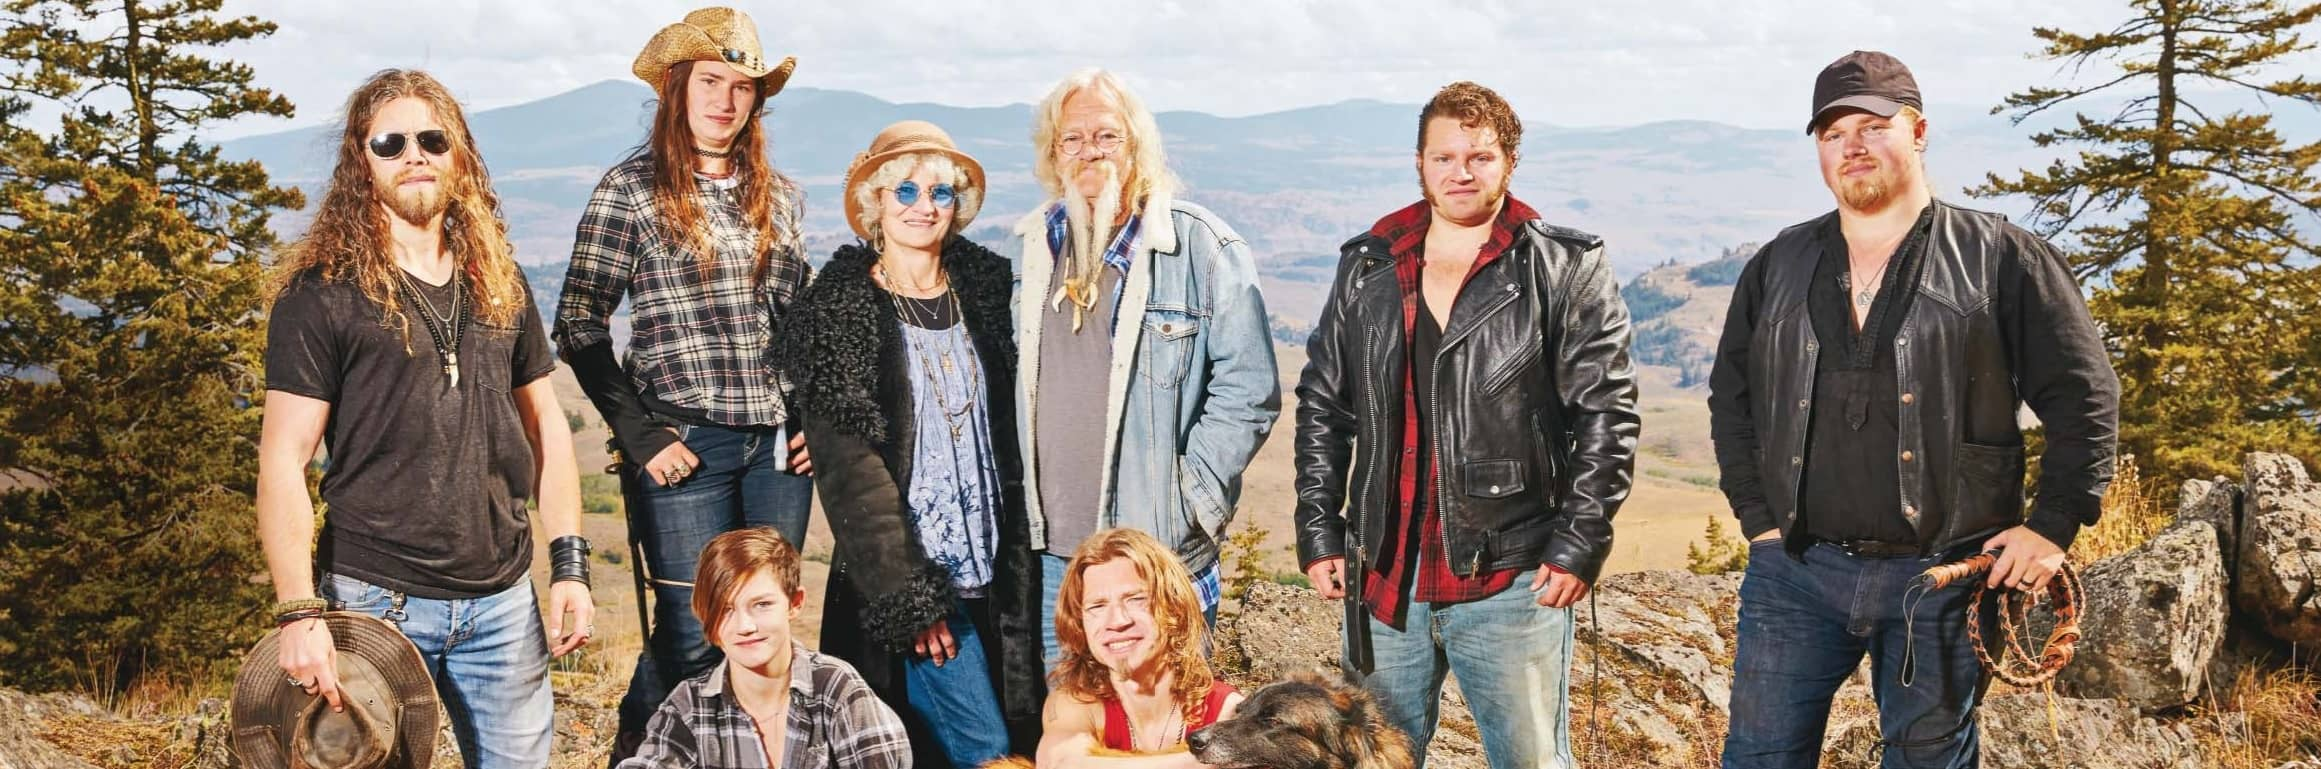 The Alaskan Bush People Family Standing Strong